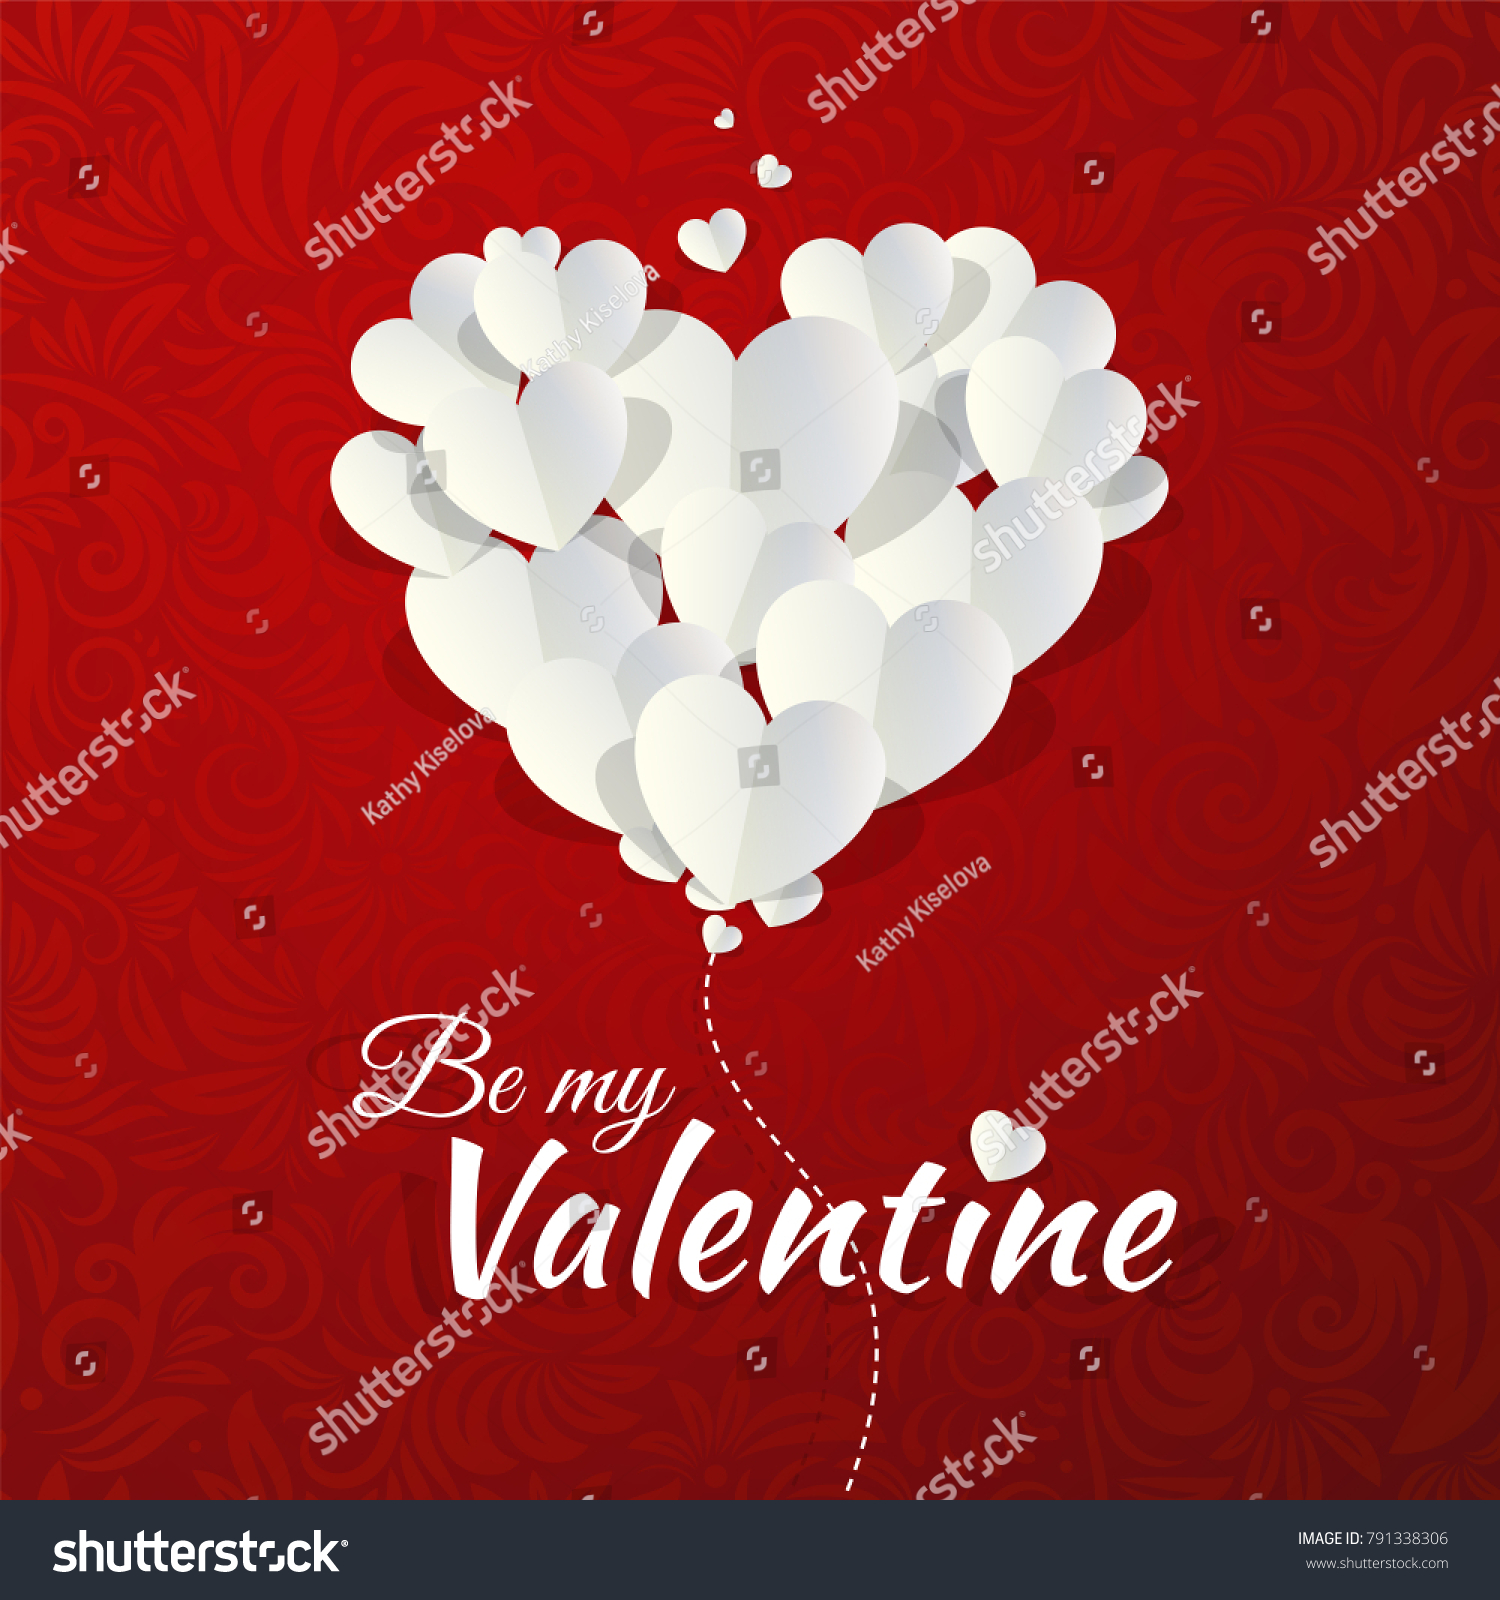 Romantic Valentines Day Invitation Card Vector Stock Vector (Royalty ...